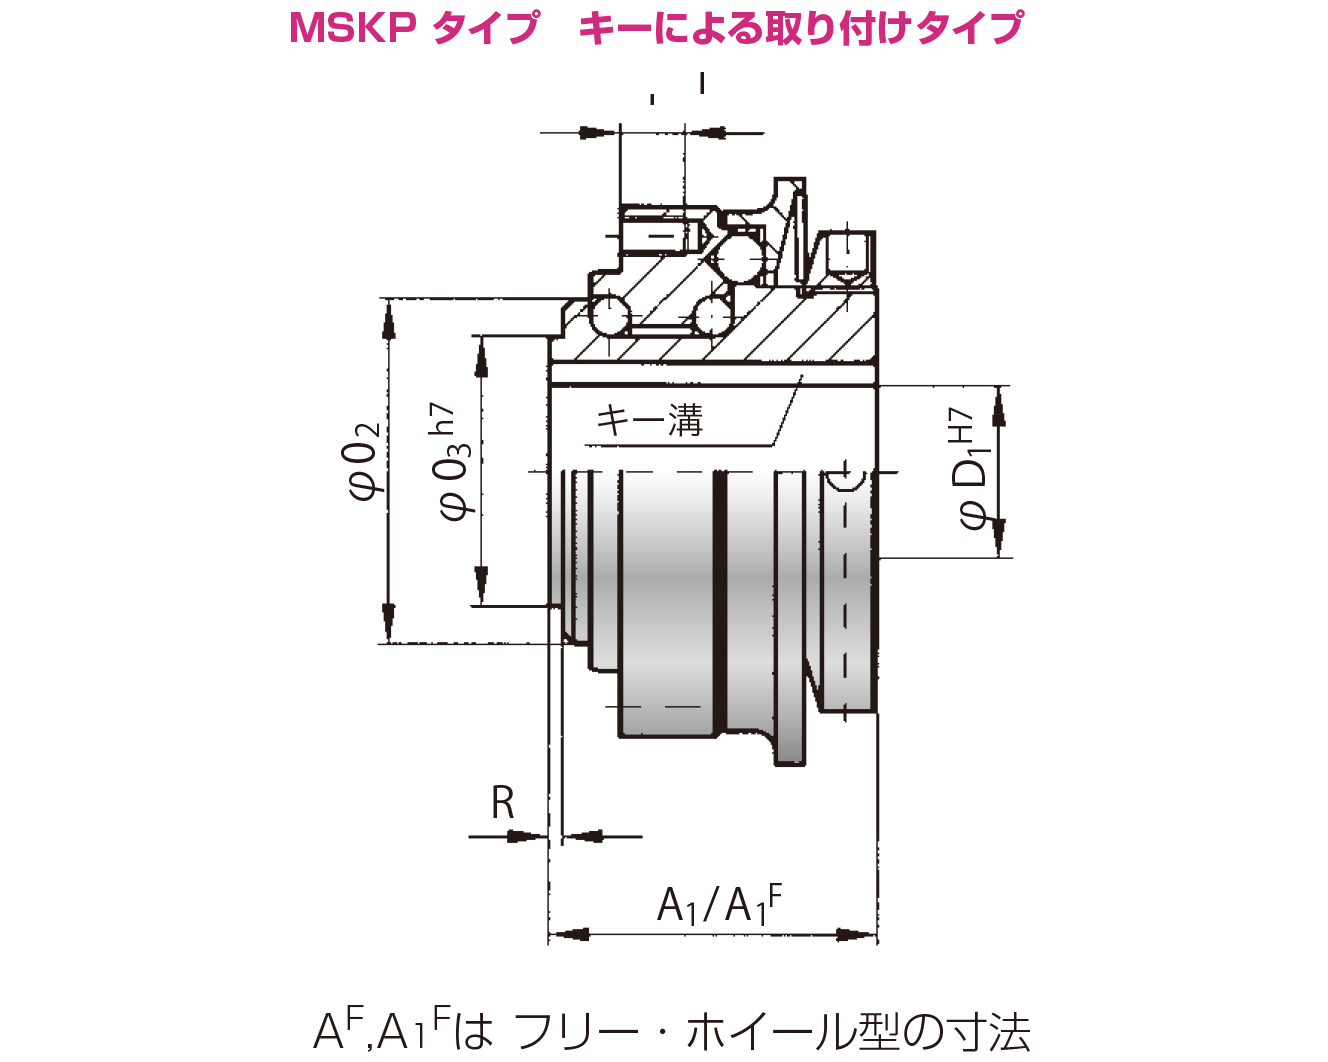 mskPの図面 マイティの安全クラッチトルクリミッタ